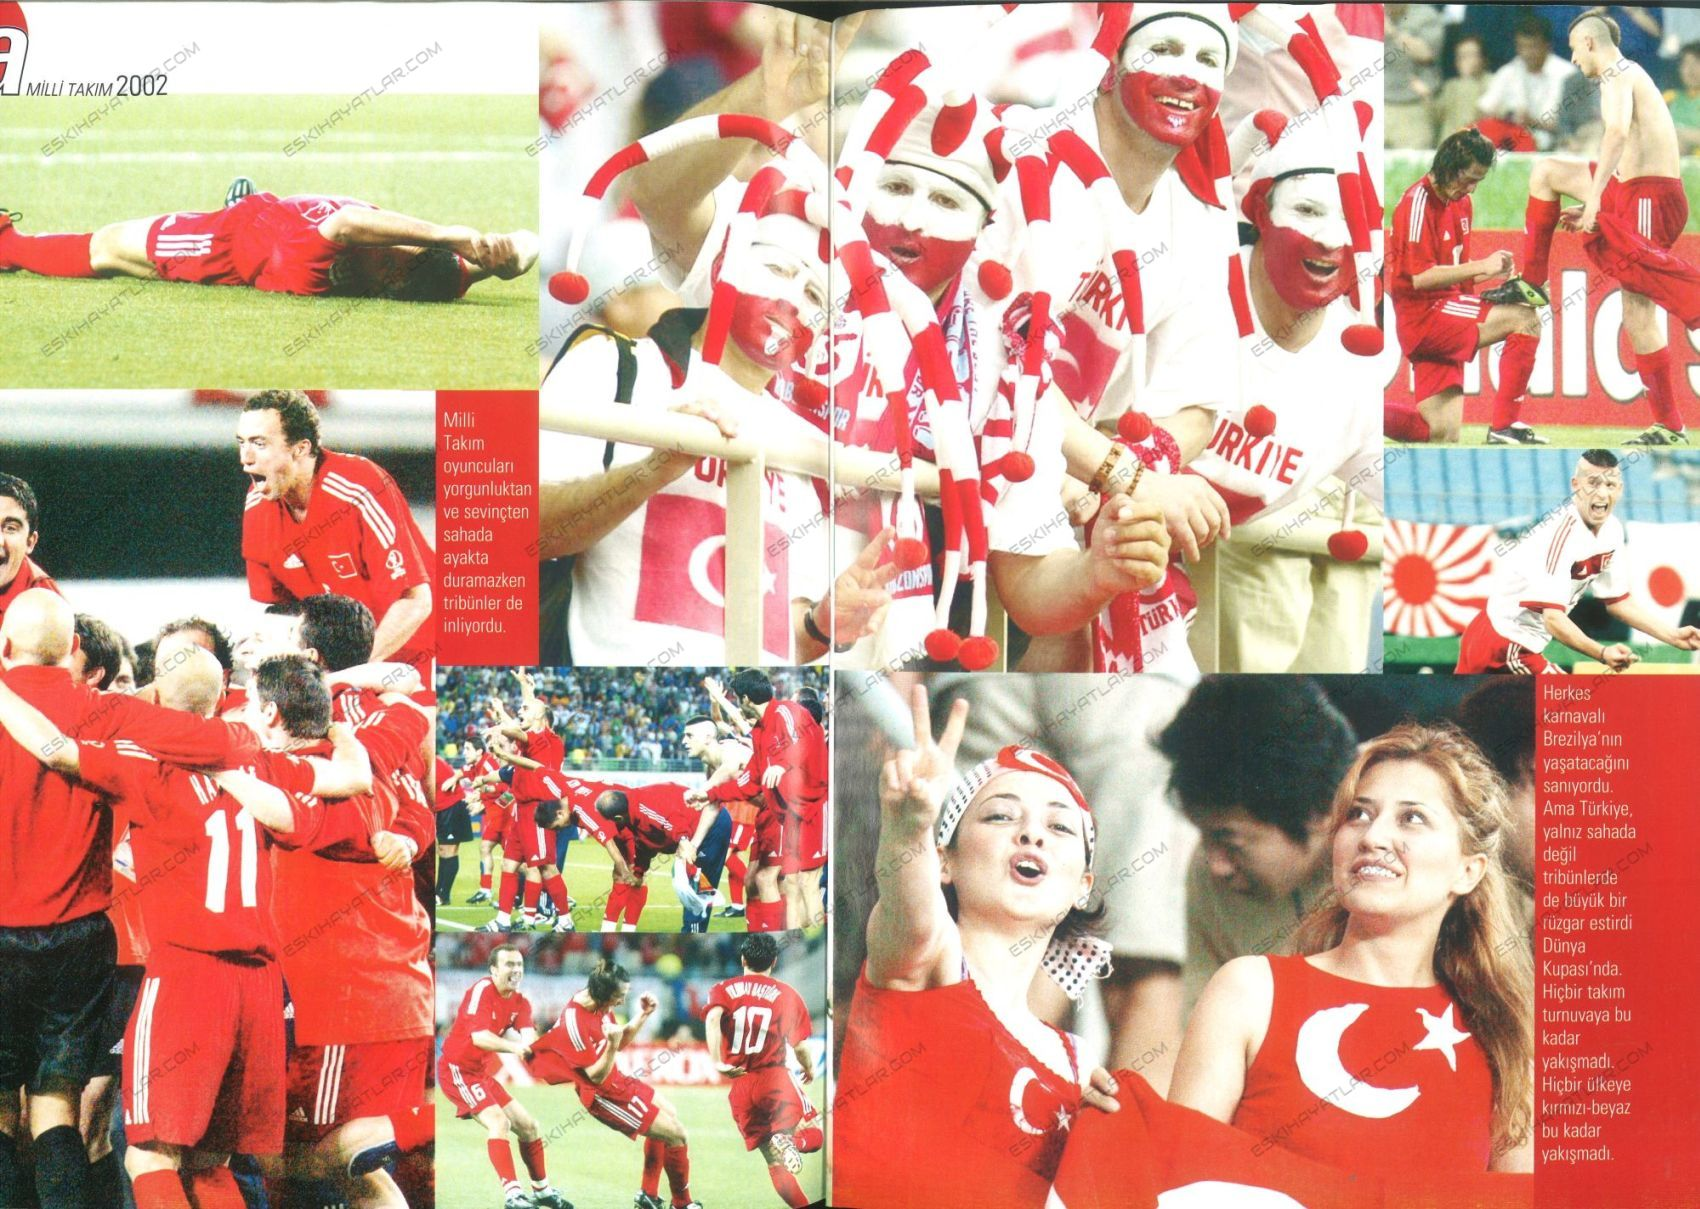 0406-turkiye-a-milli-takimi-2002-dunya-kupasi-kadrosu-aktuel-dergisi (3)